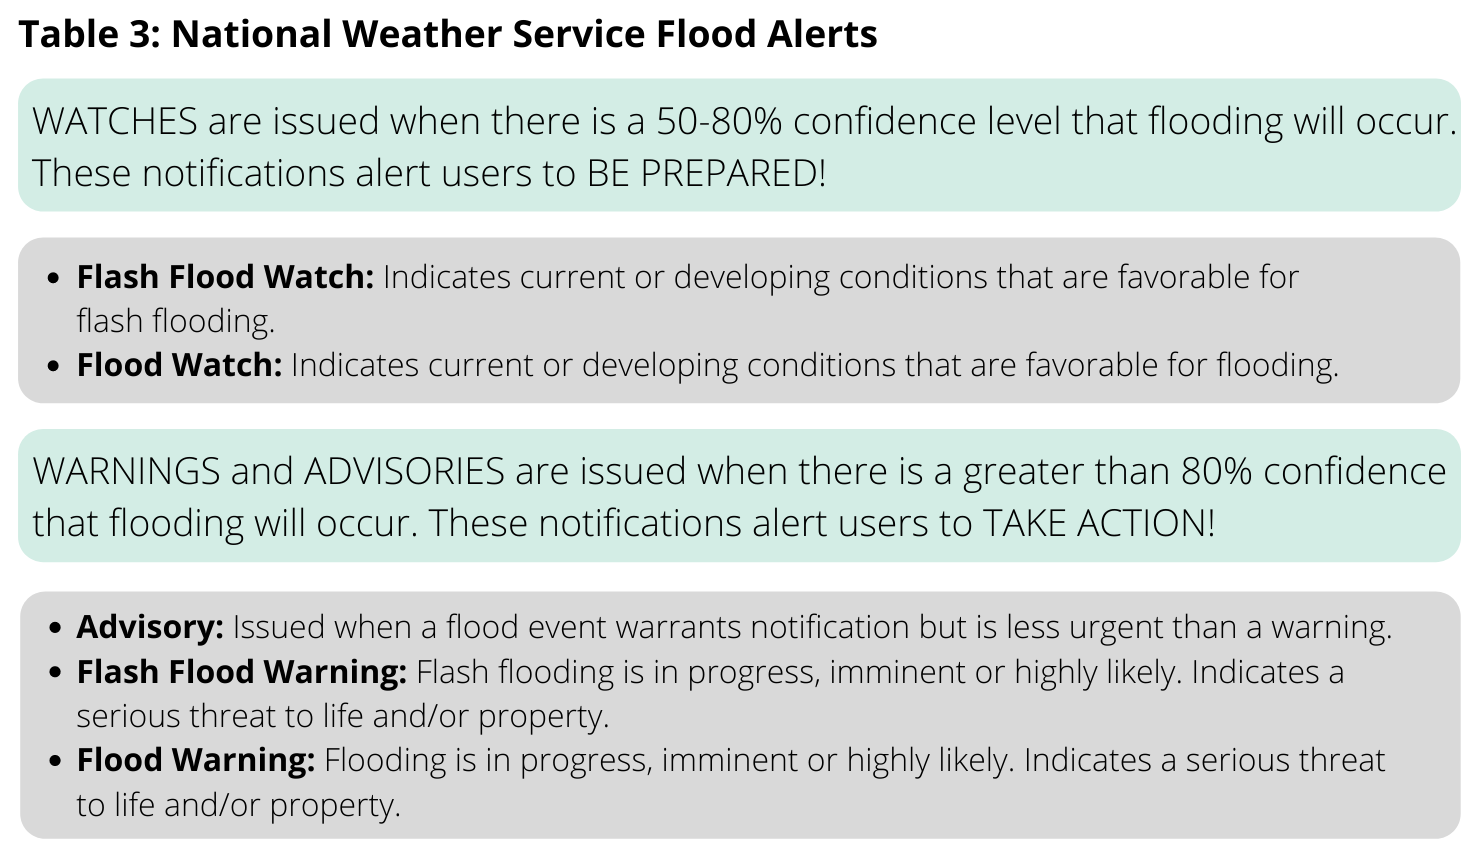 National Weather Service flood alert definitions